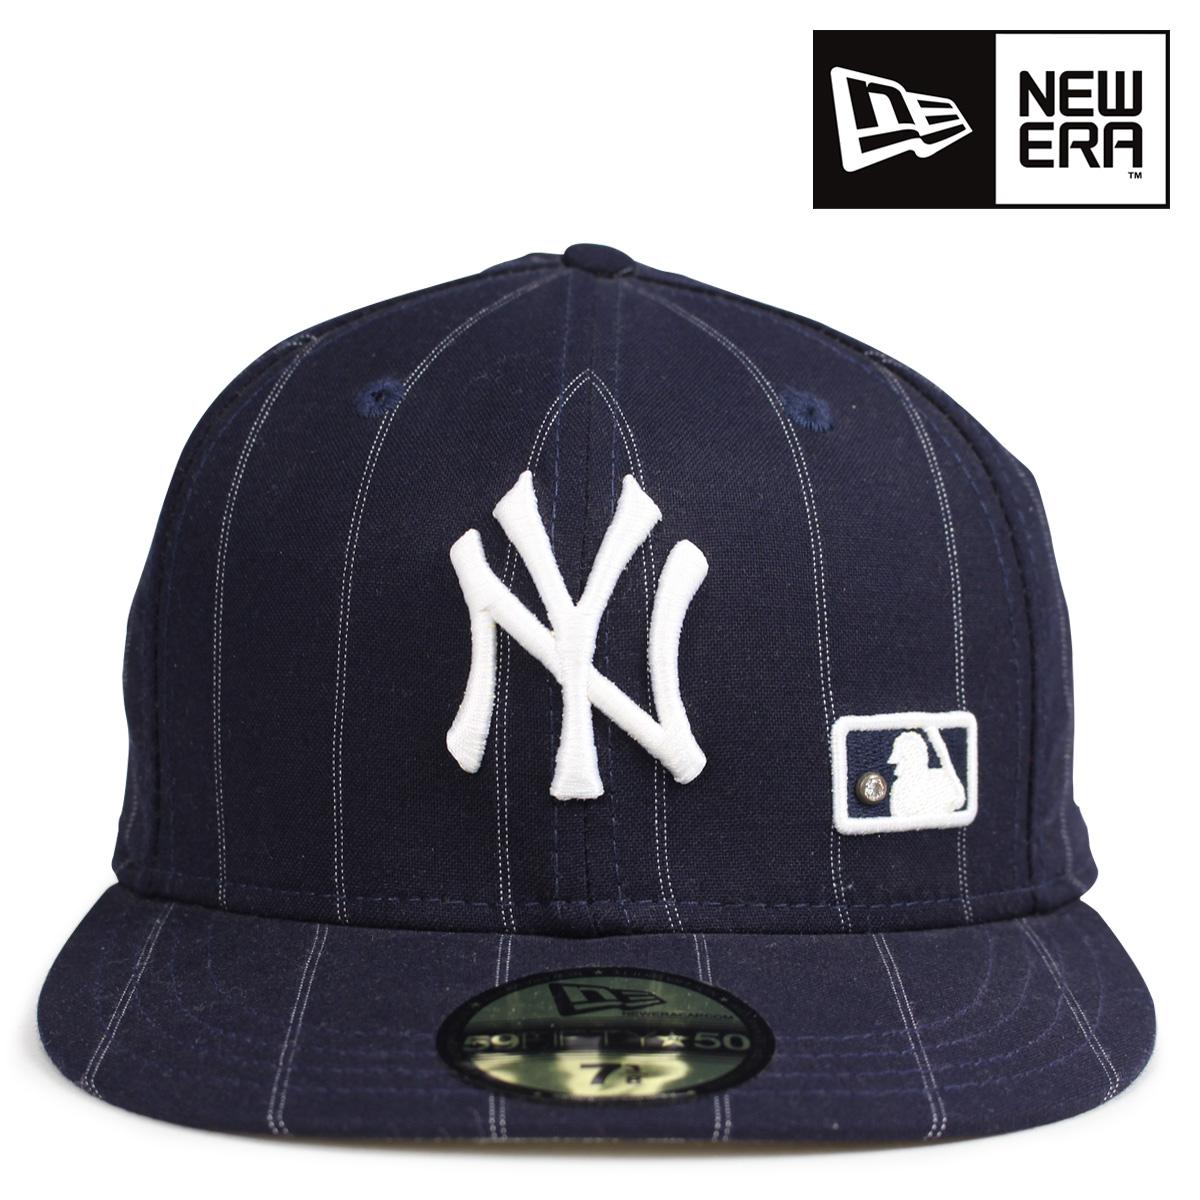 NEW ERA 59FIFTY CAPTURE THE FLAG MLB ニューエラ キャップ ニューヨーク ヤンキース メンズ ネイビー